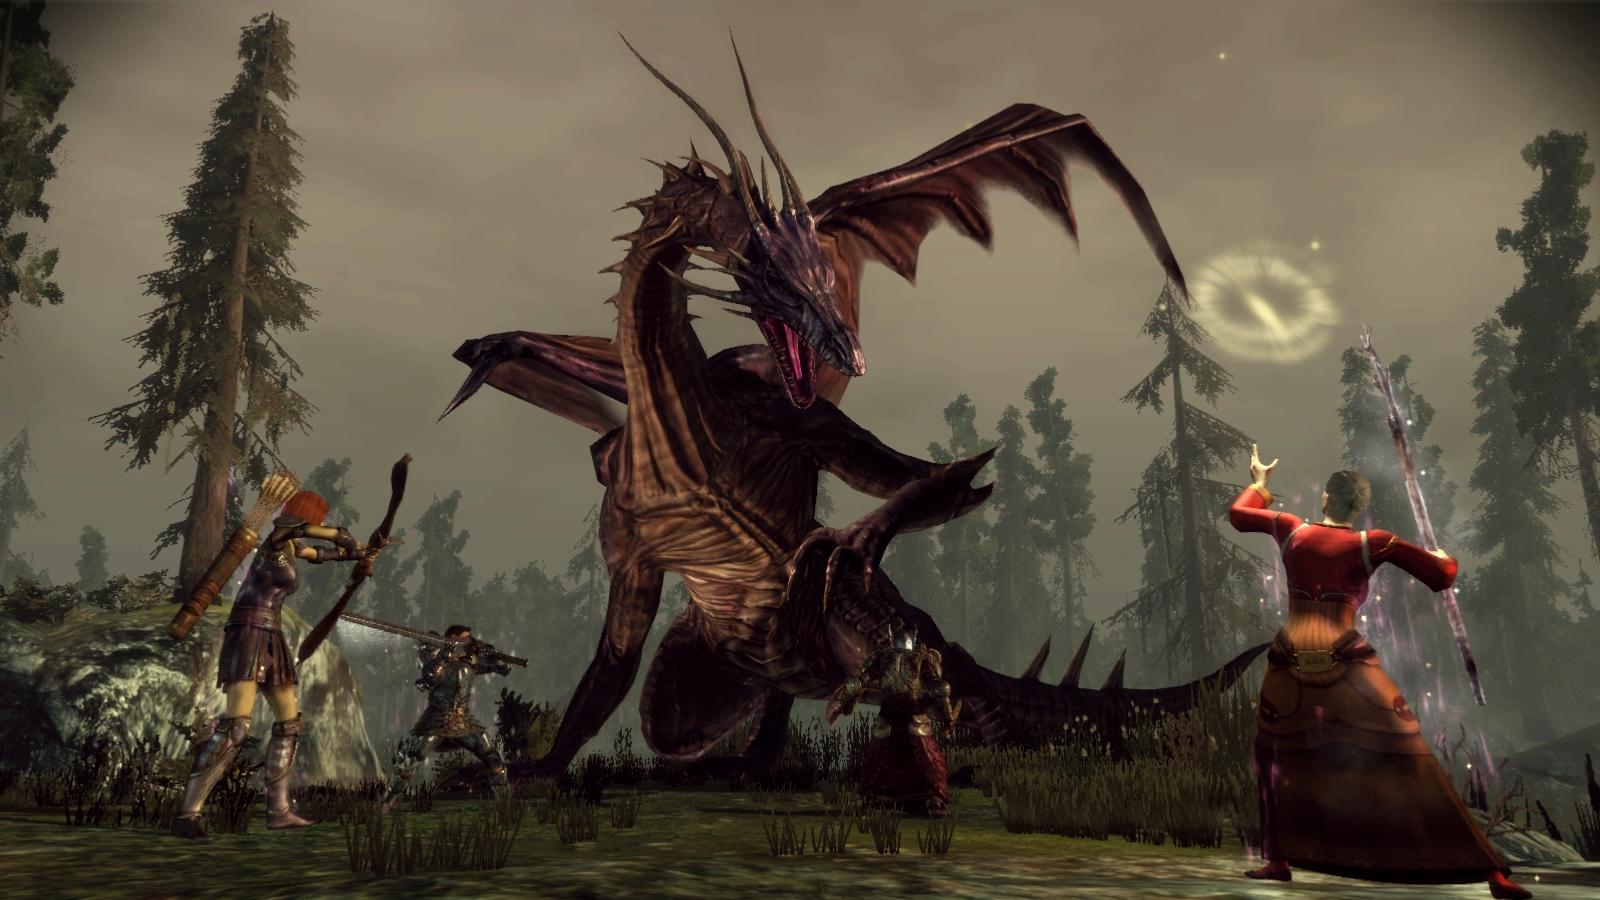 Dragon Age BioWare Sequel In Works